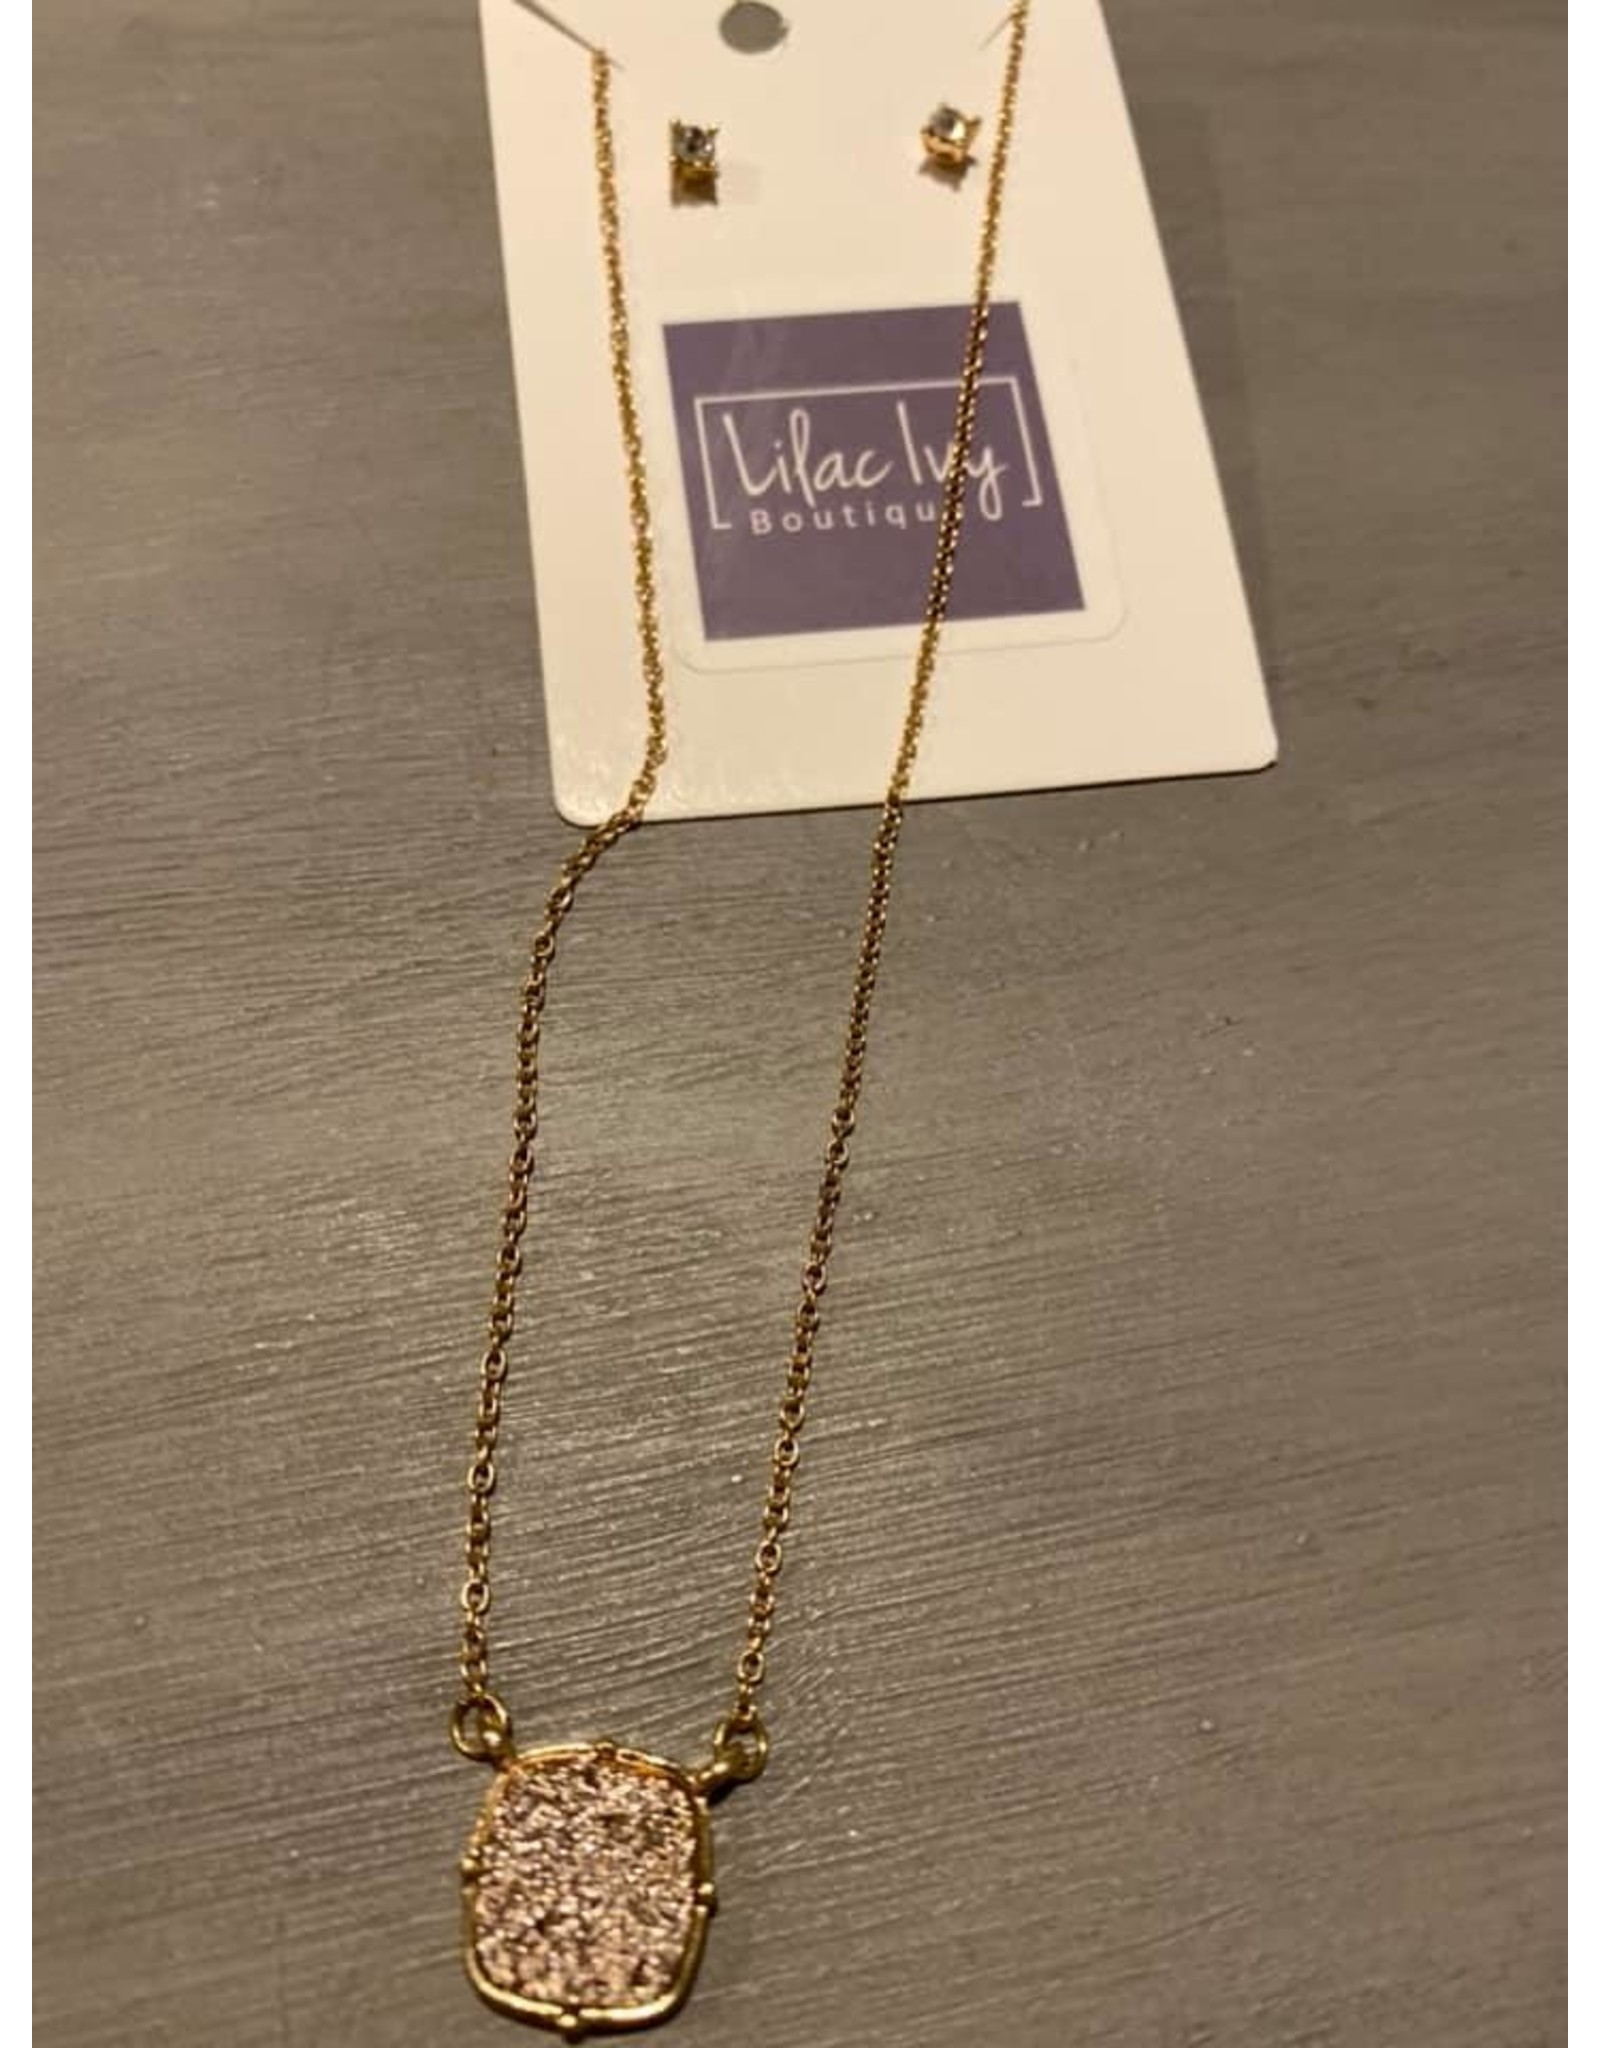 Square druzy rhinestone necklace